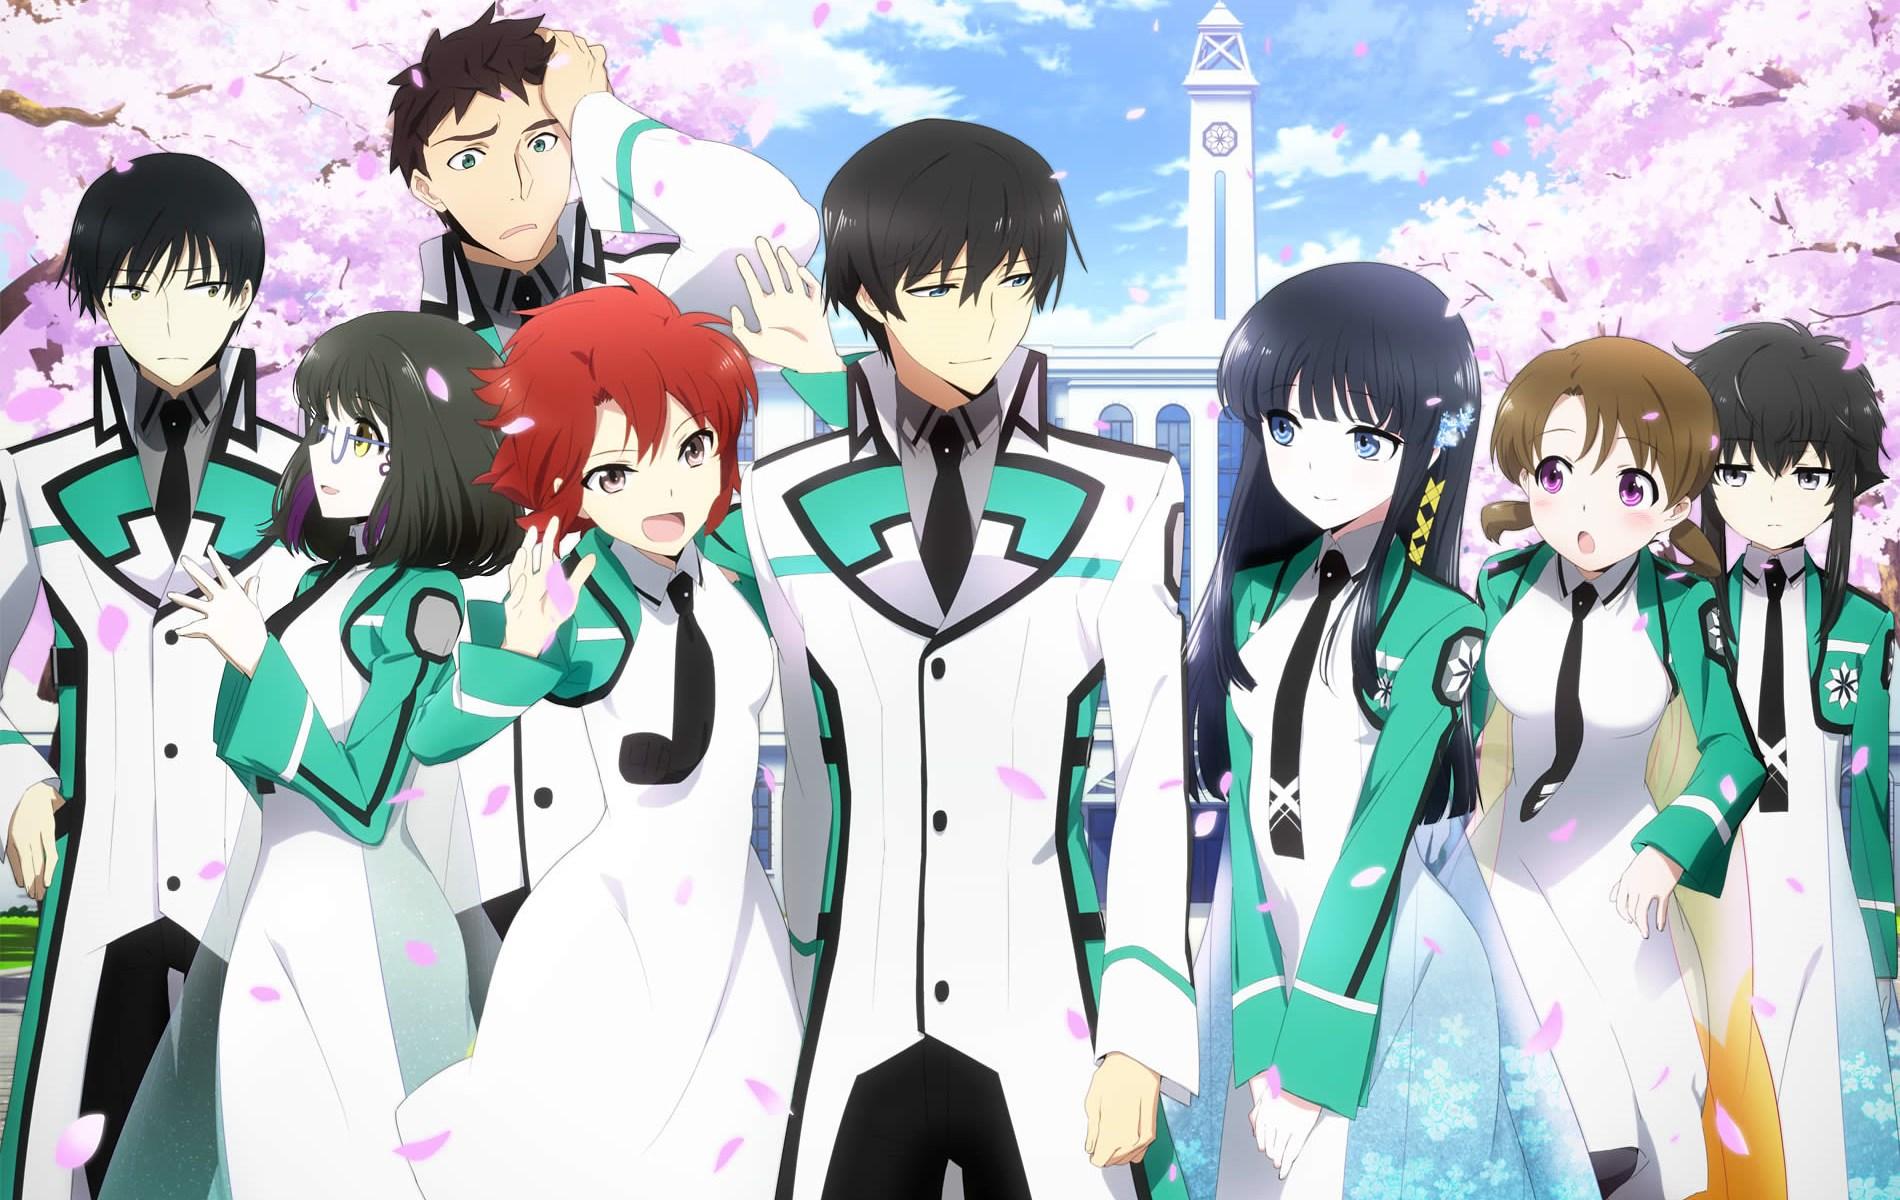 547032 - Un género, un anime - Hablemos de Anime y Manga